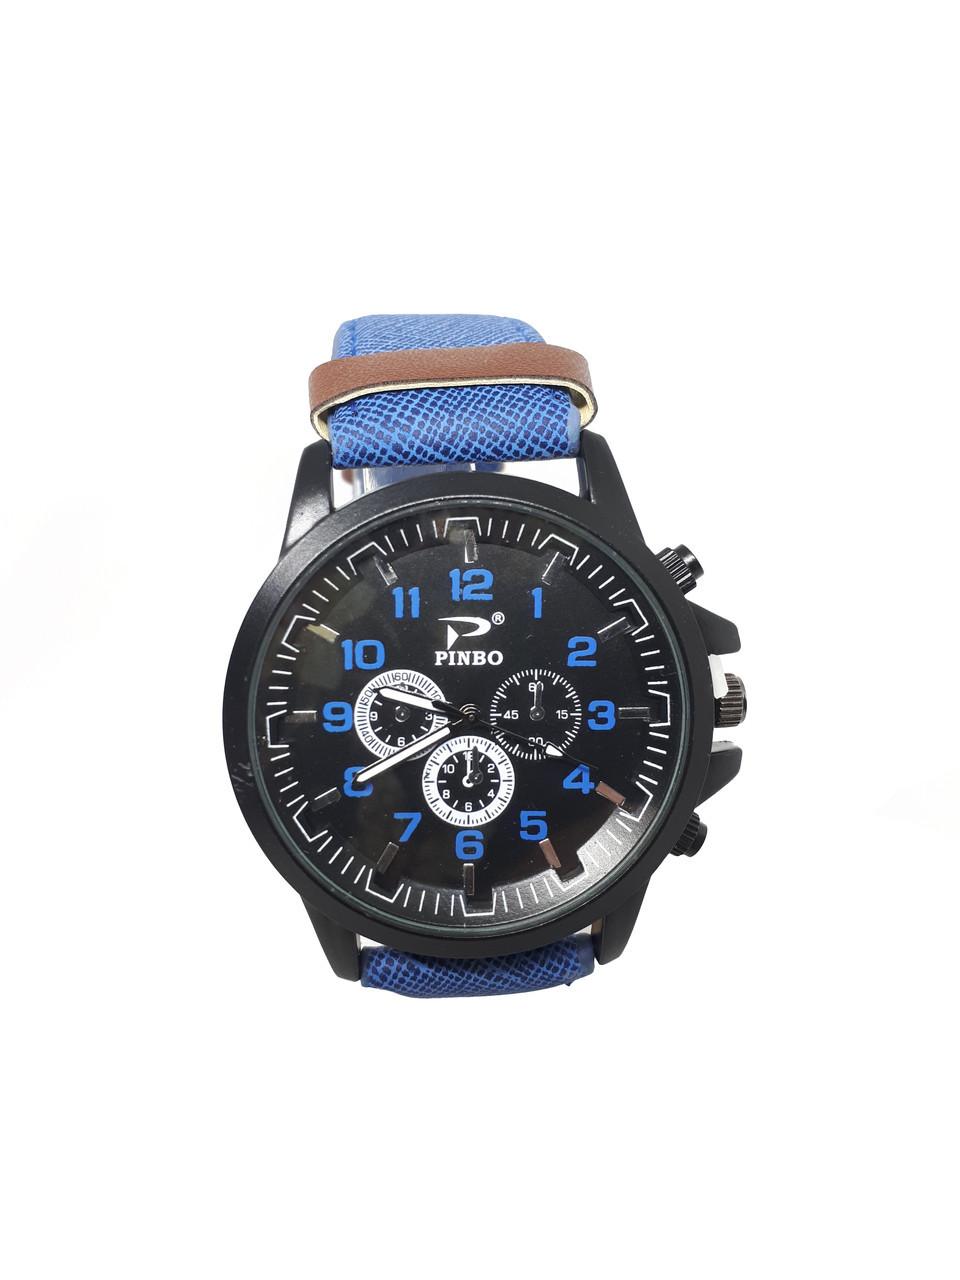 Часы мужские Pinbo Sport на  ремешке опт. Синий